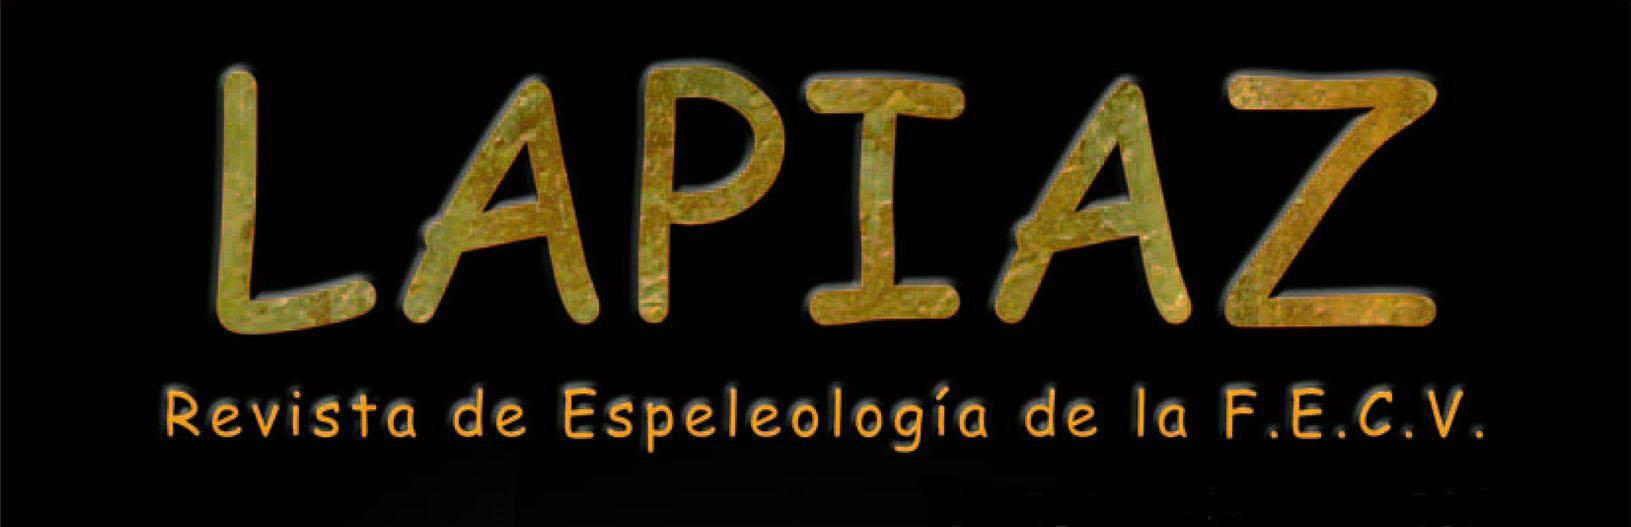 Revista Lapiaz